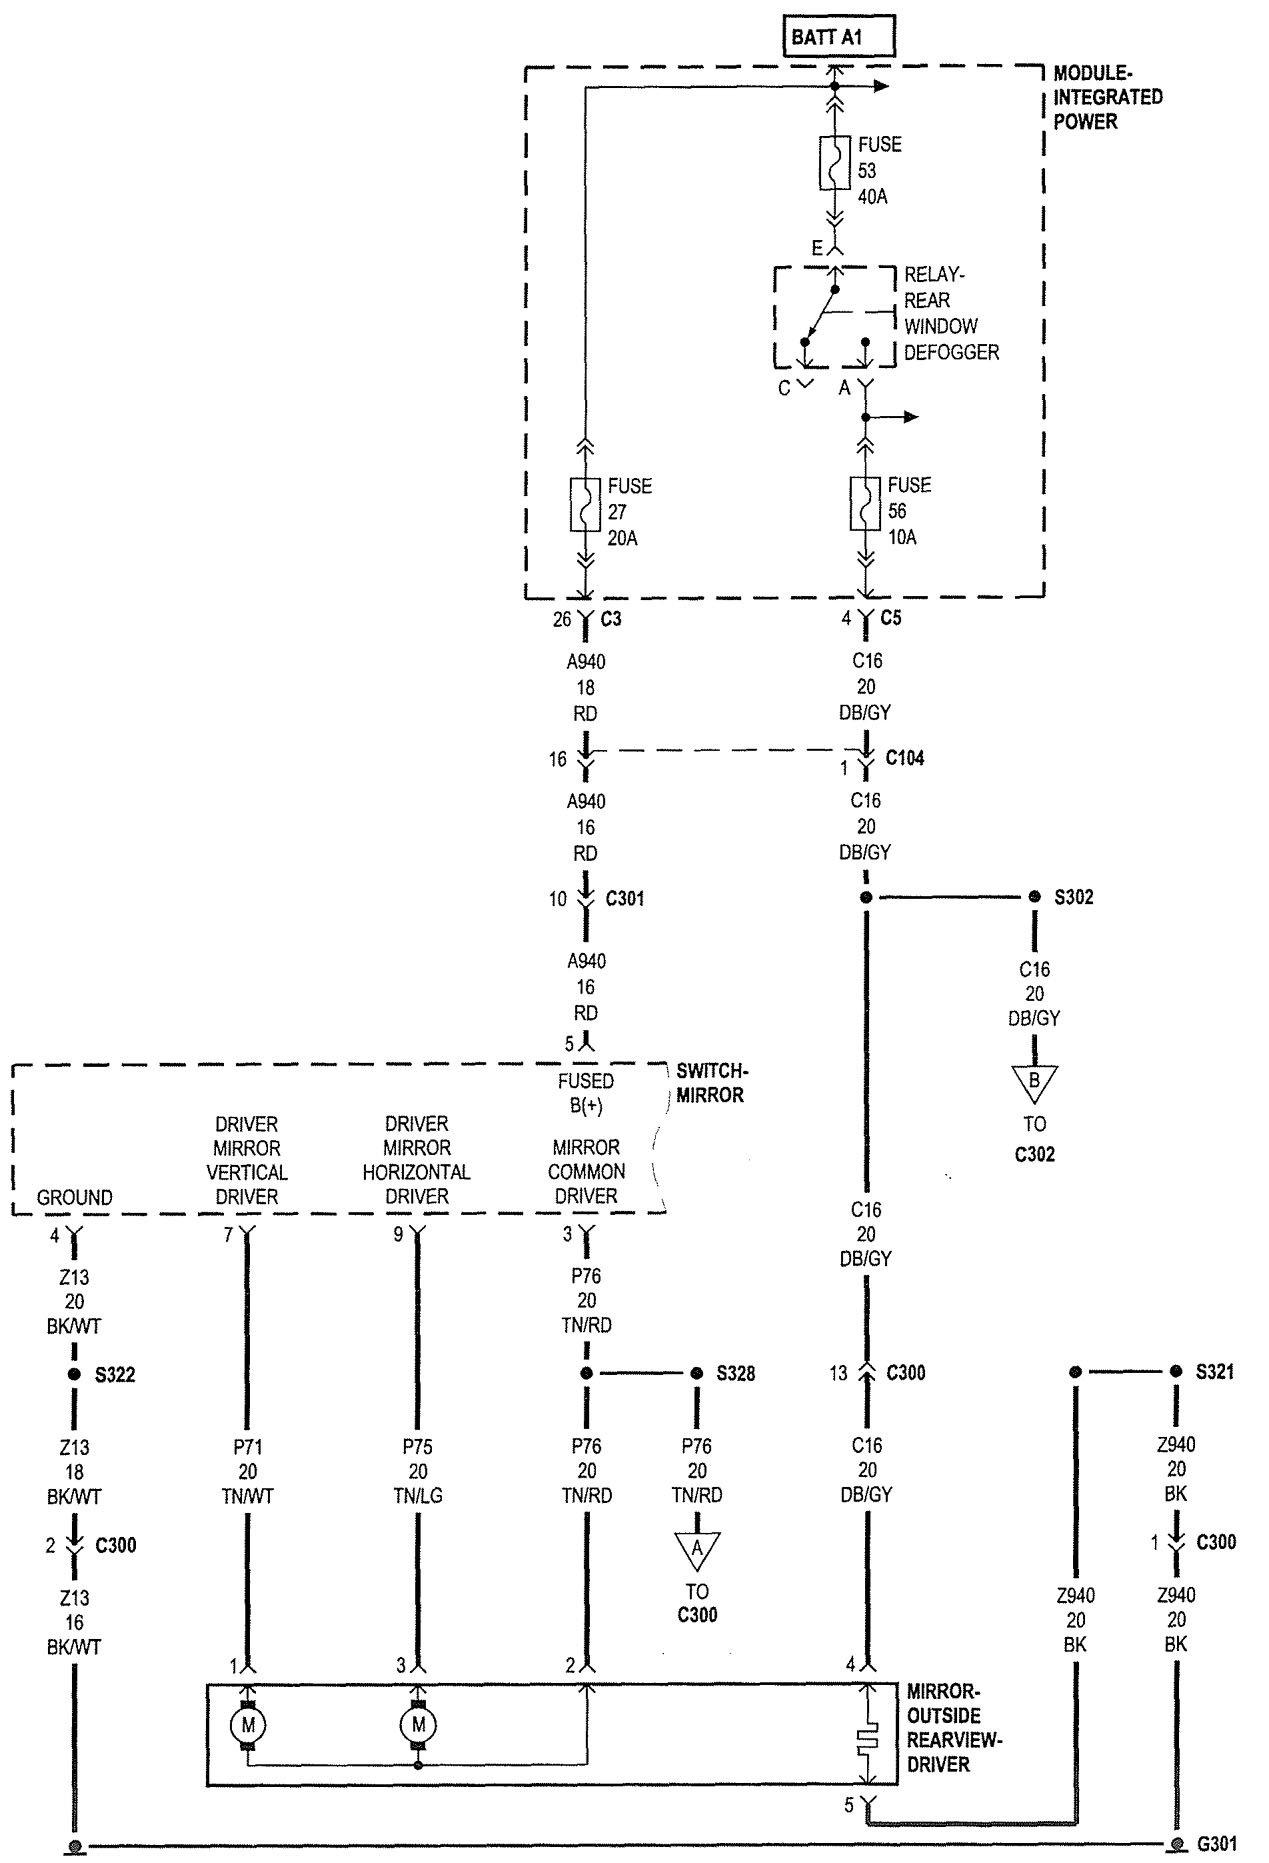 2010 Dodge Dakota Looking To Add Heated Defrost Mirrors ... on monitor wiring diagram, acura rsx ignition wiring diagram, tachometer wiring diagram, telephone wiring diagram, exhaust brake wiring diagram, fog lights wiring diagram, air conditioning wiring diagram, towing package wiring diagram, cd player wiring diagram, a/c wiring diagram, center console wiring diagram, remote starter wiring diagram, power seat wiring diagram, heater wiring diagram, cruise control wiring diagram, defrost timer wiring diagram, turn signal wiring diagram, power windows wiring diagram, titan trailer wiring diagram, nissan titan wiring harness diagram,